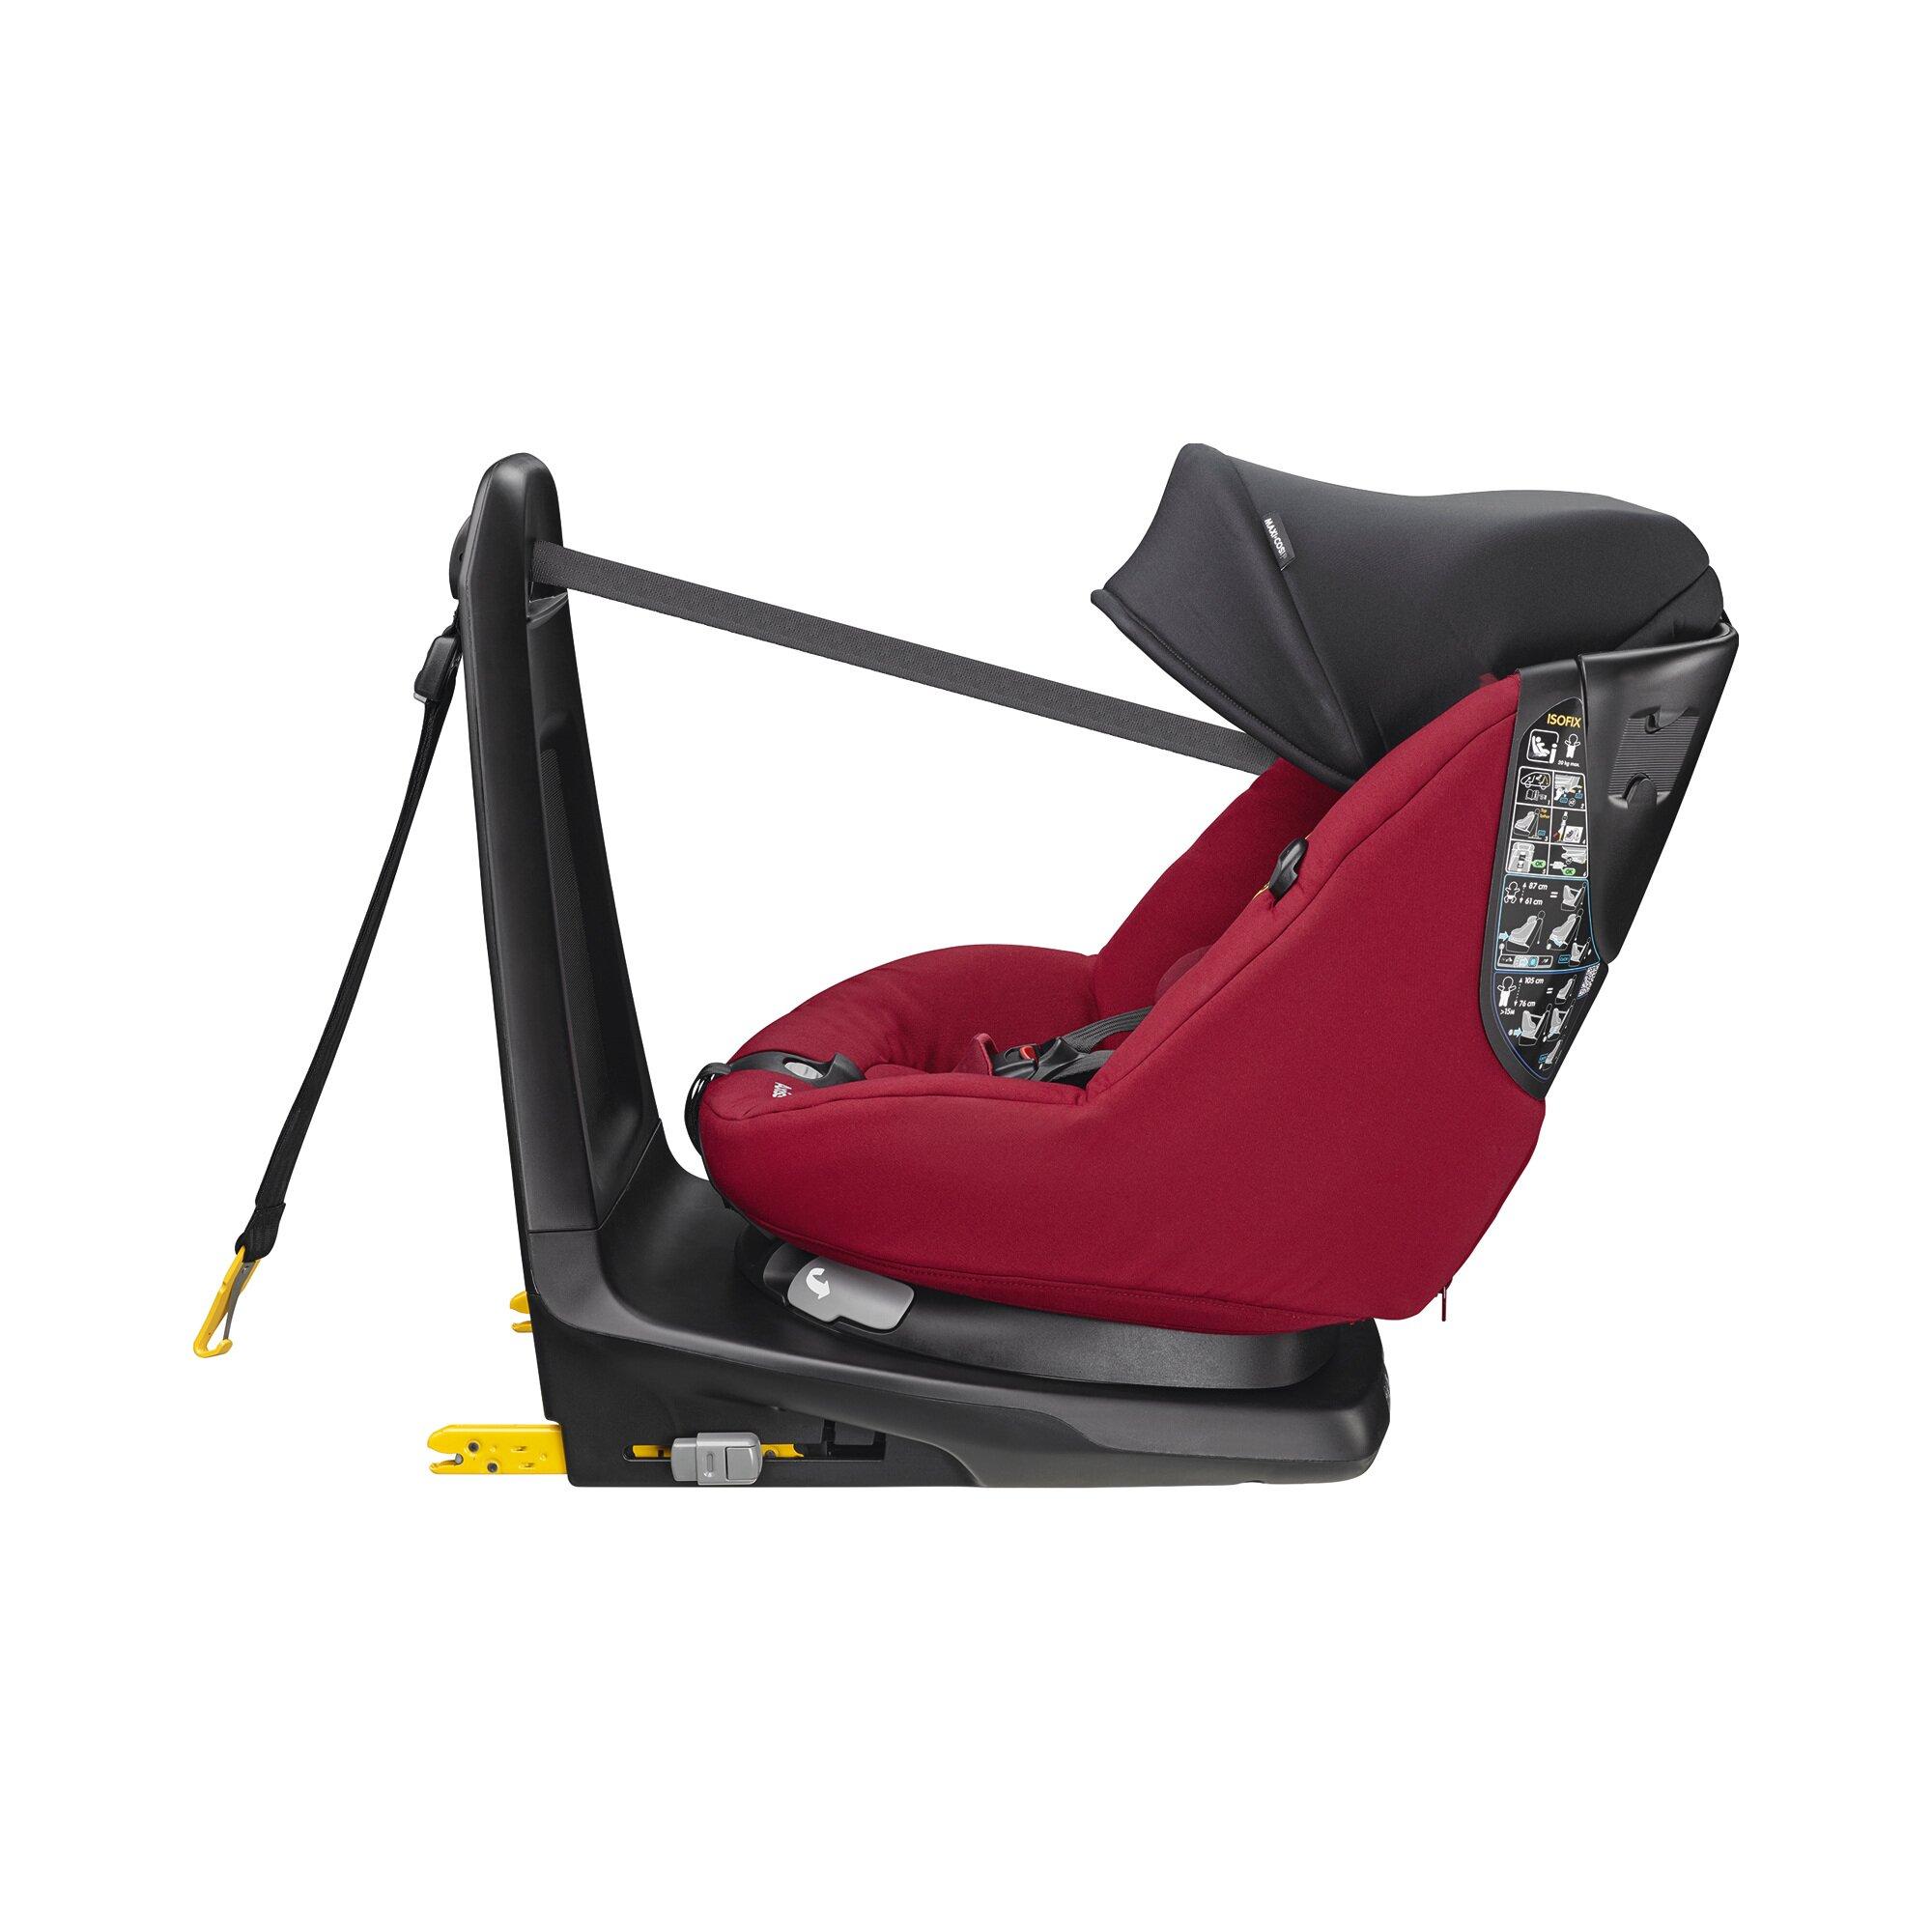 axissfix-reboard-kindersitz-design-2017-braun, 298.99 EUR @ babywalz-de